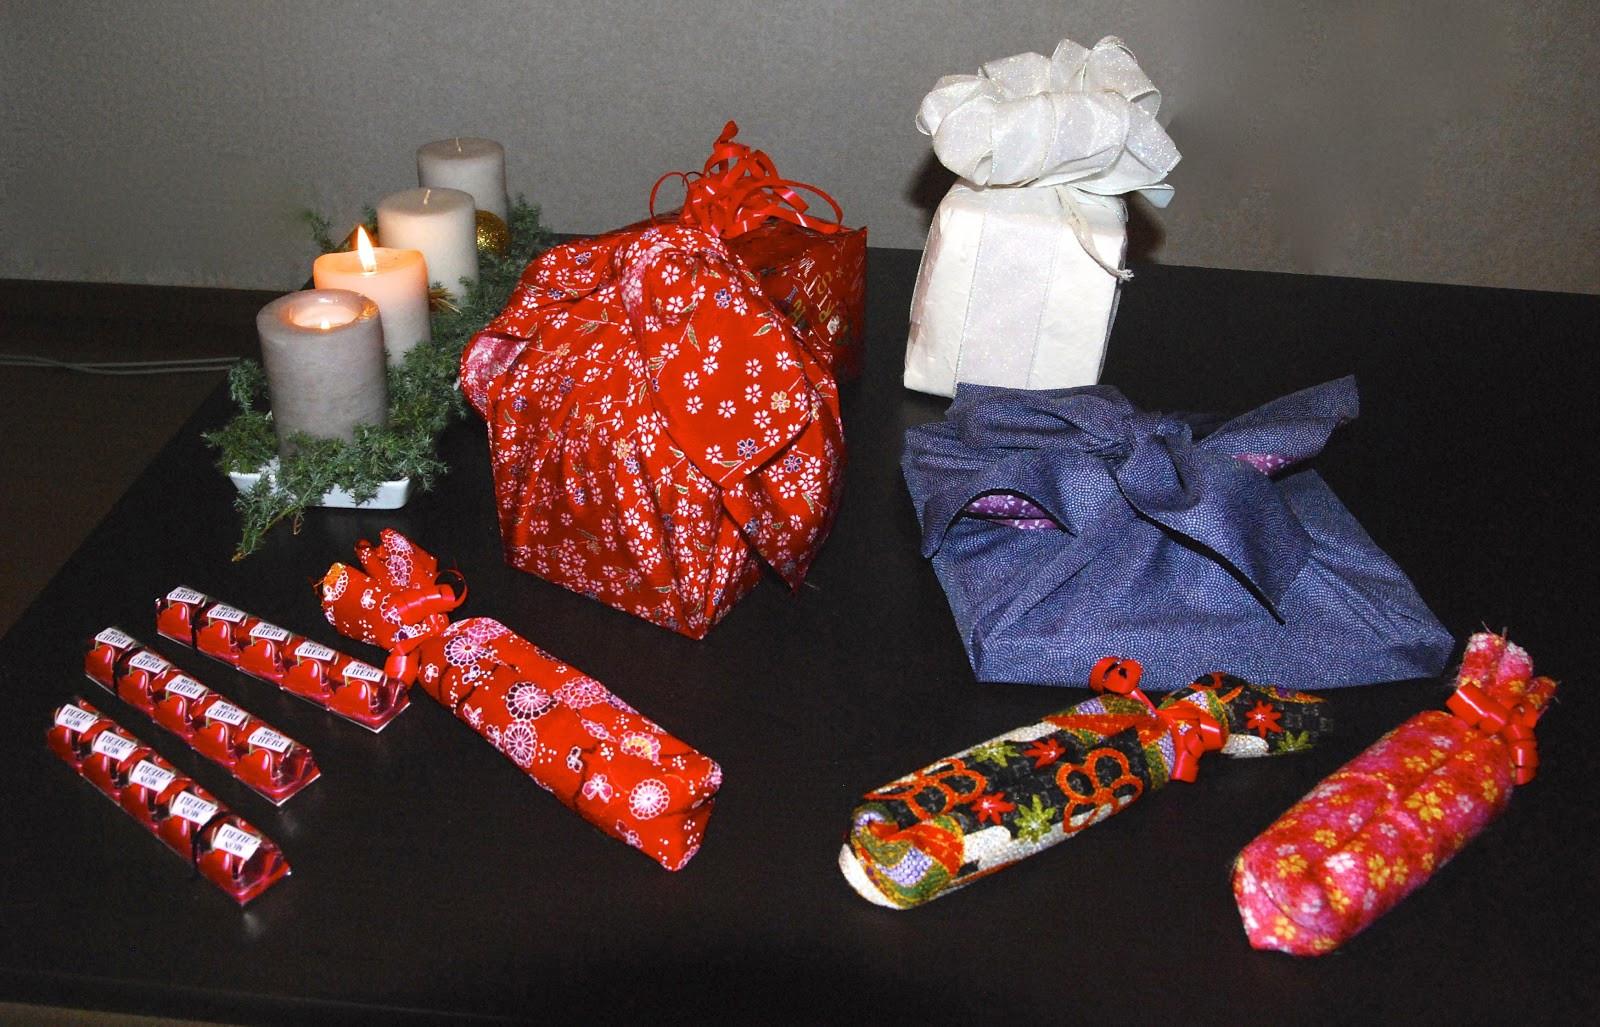 Japanische Geschenke  Furoshiki japanisch Geschenke verpacken